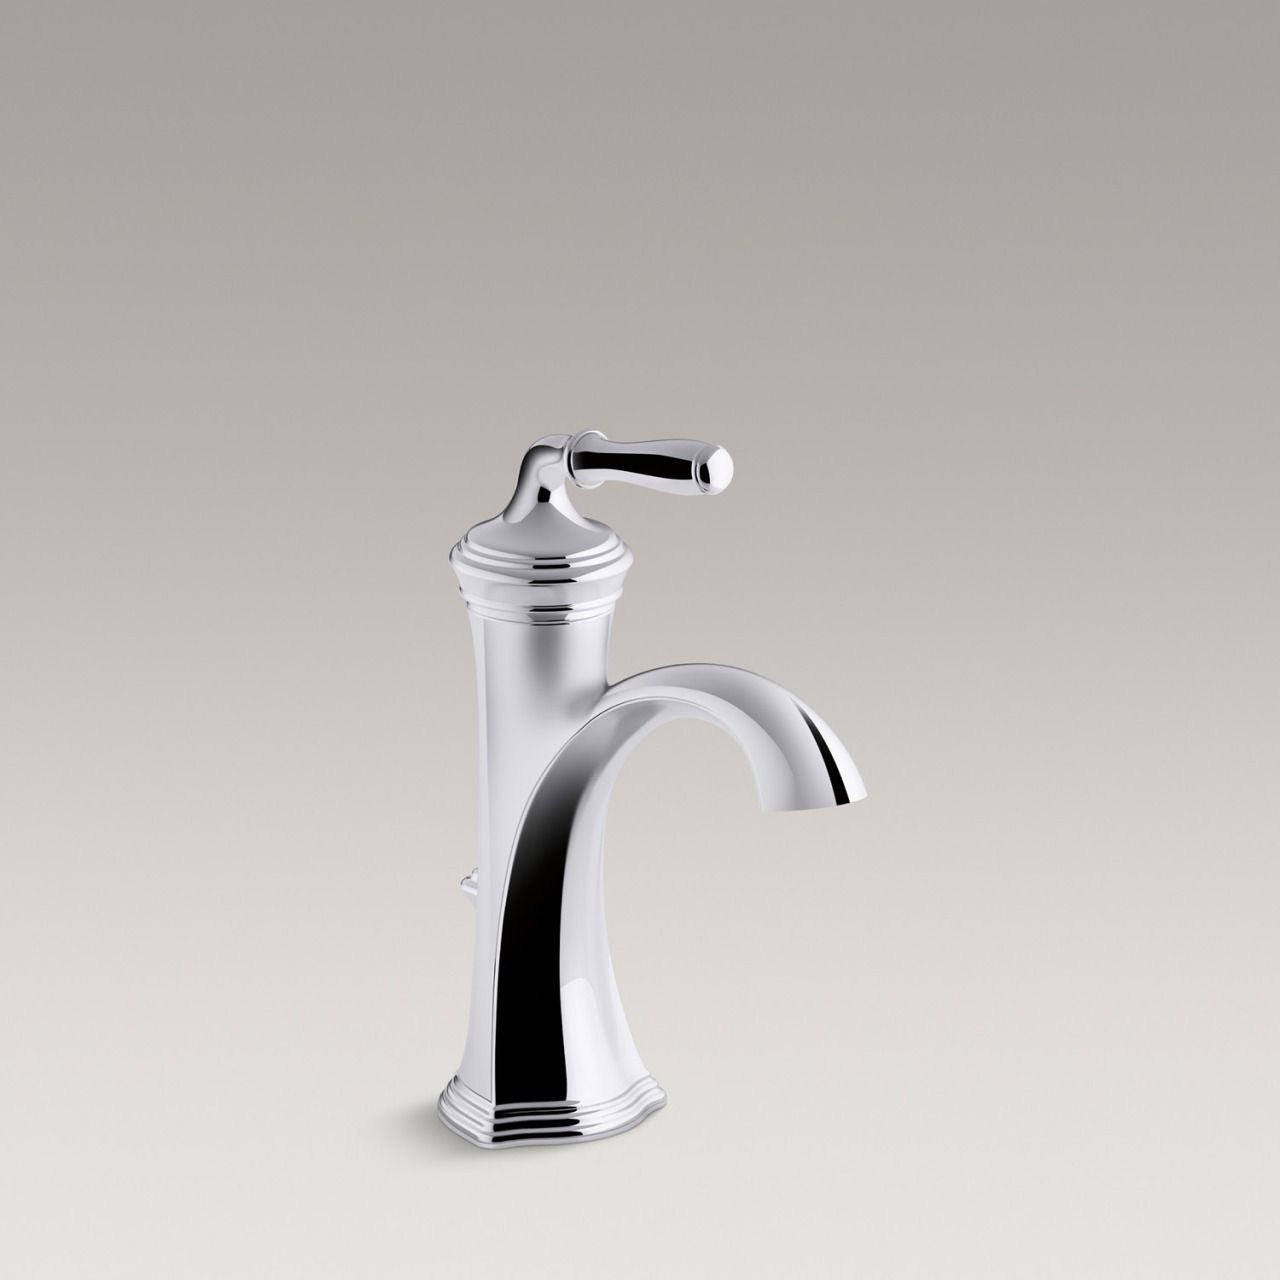 K 193 4 Devonshire Single Handle Bathroom Sink Faucet Kohler Sink Faucet Bathroom Sink Faucets